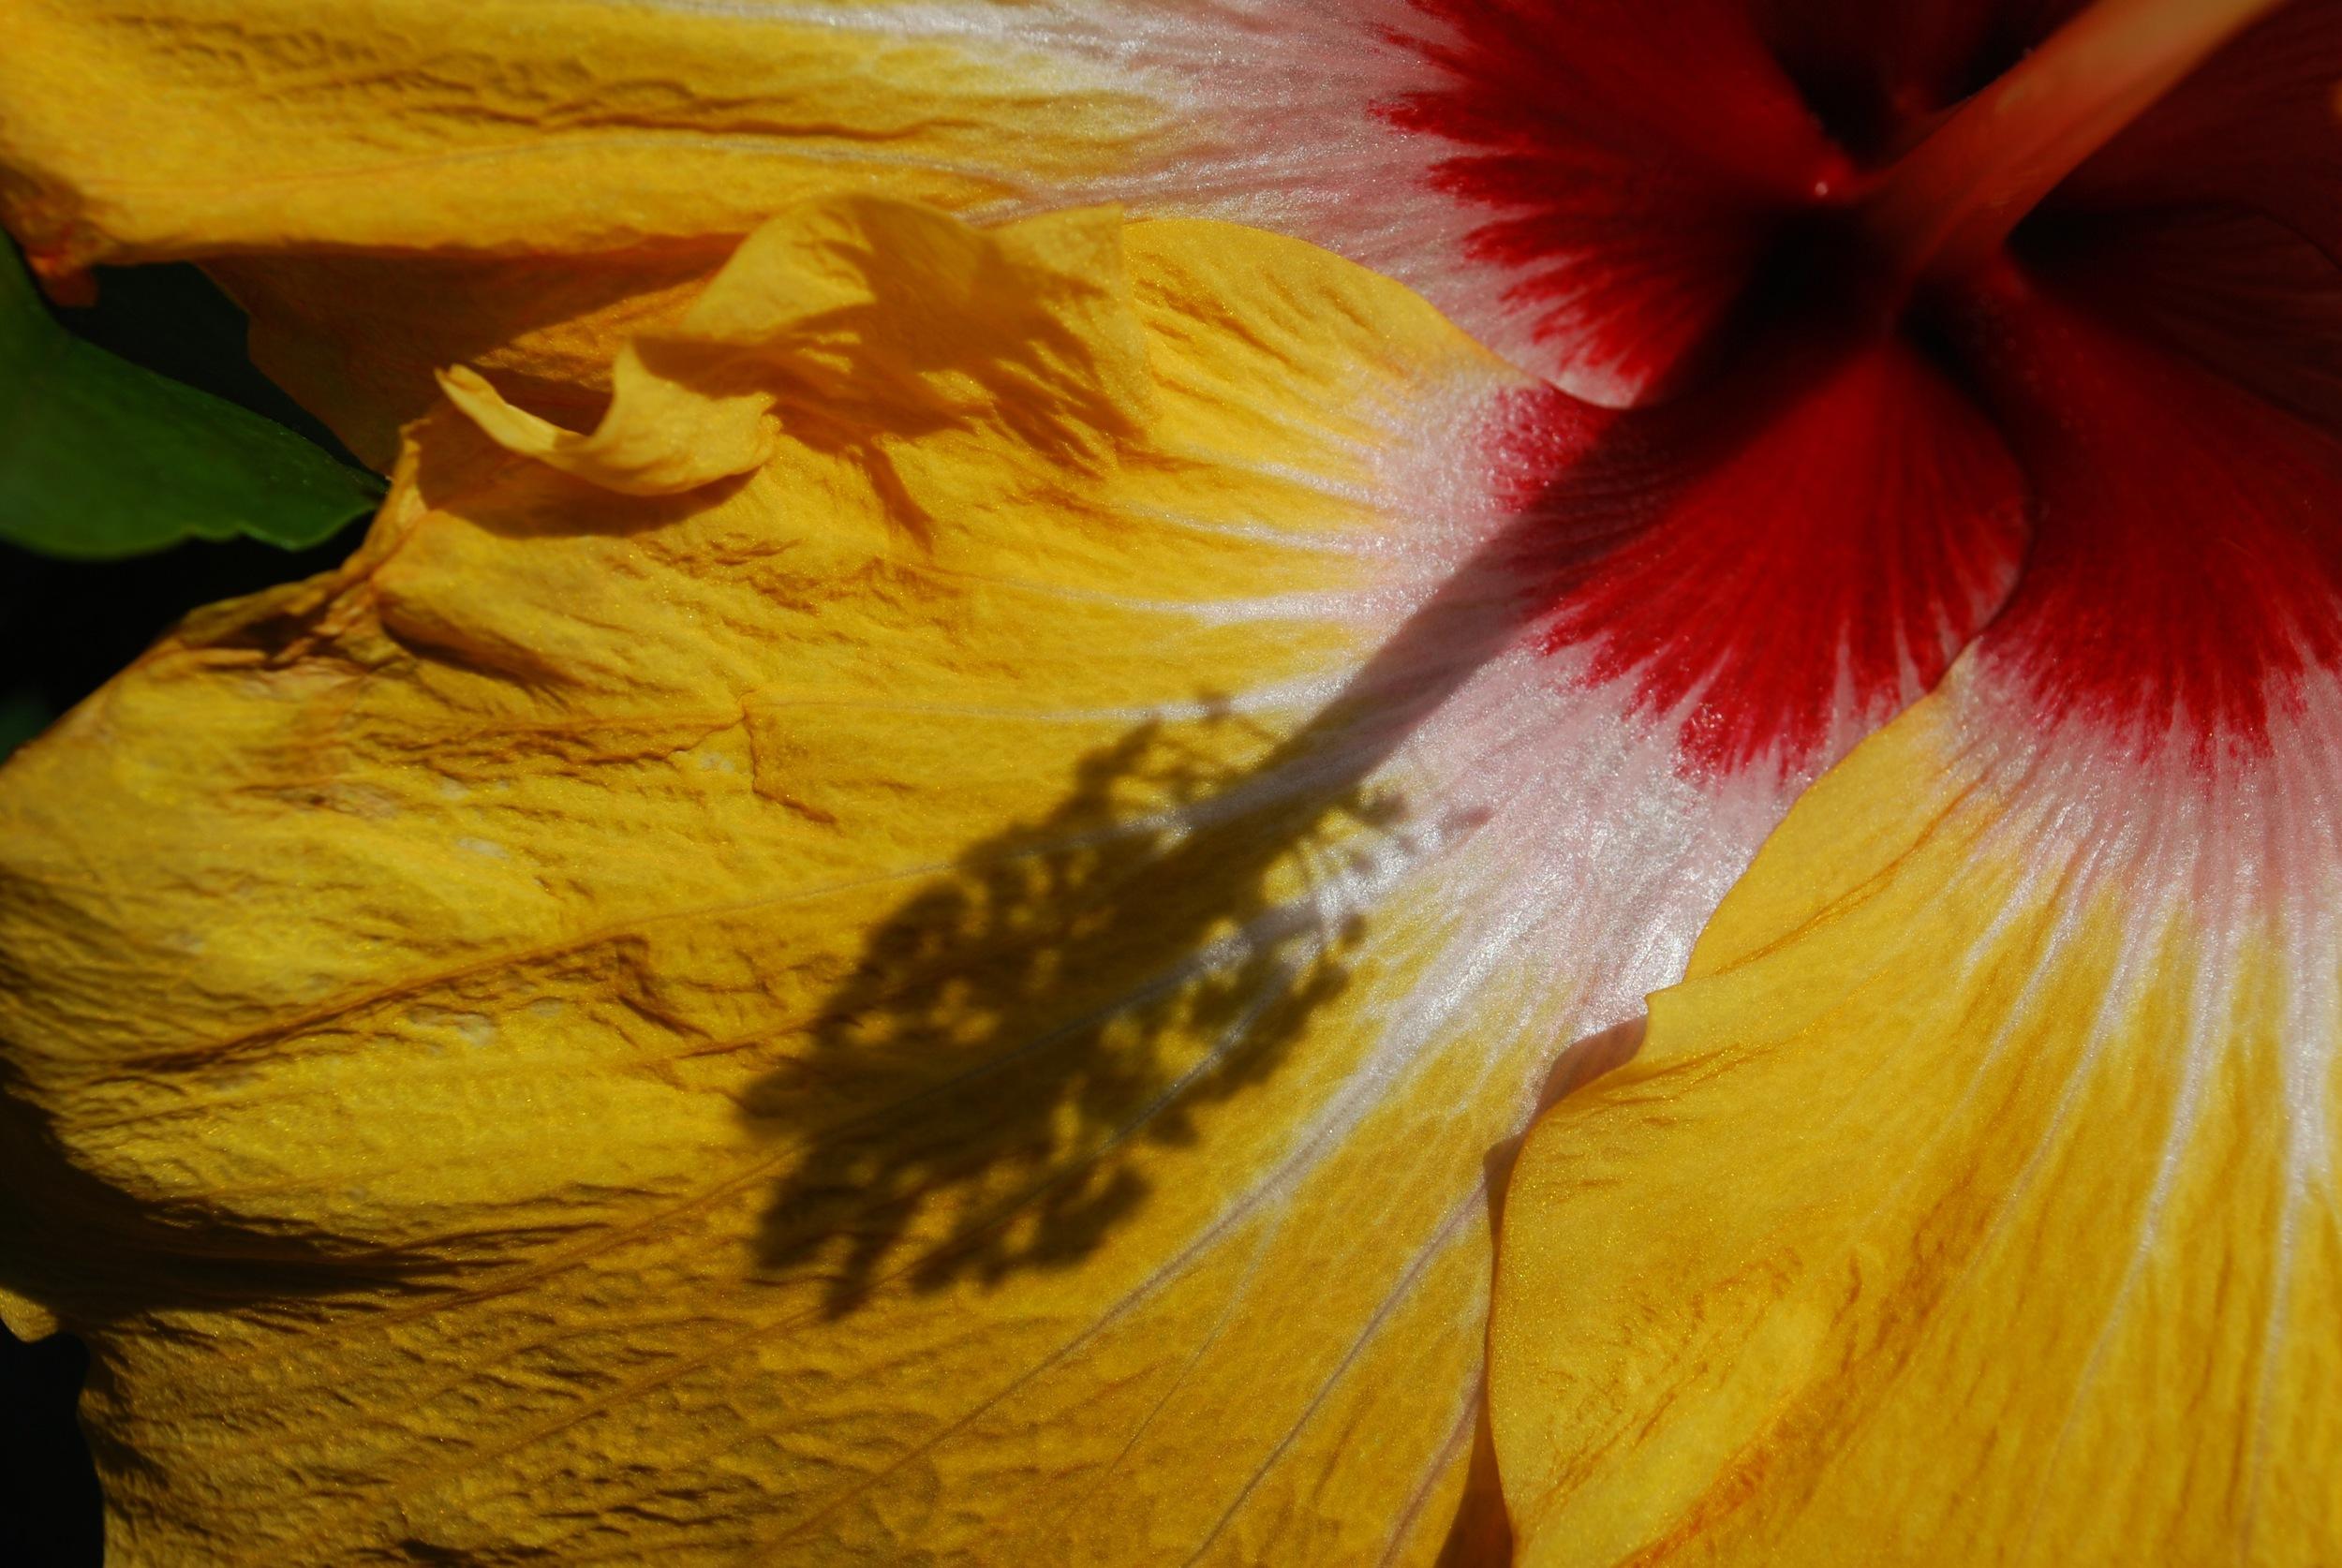 Longwood Gardens in bloom - Quick shots, November 2011